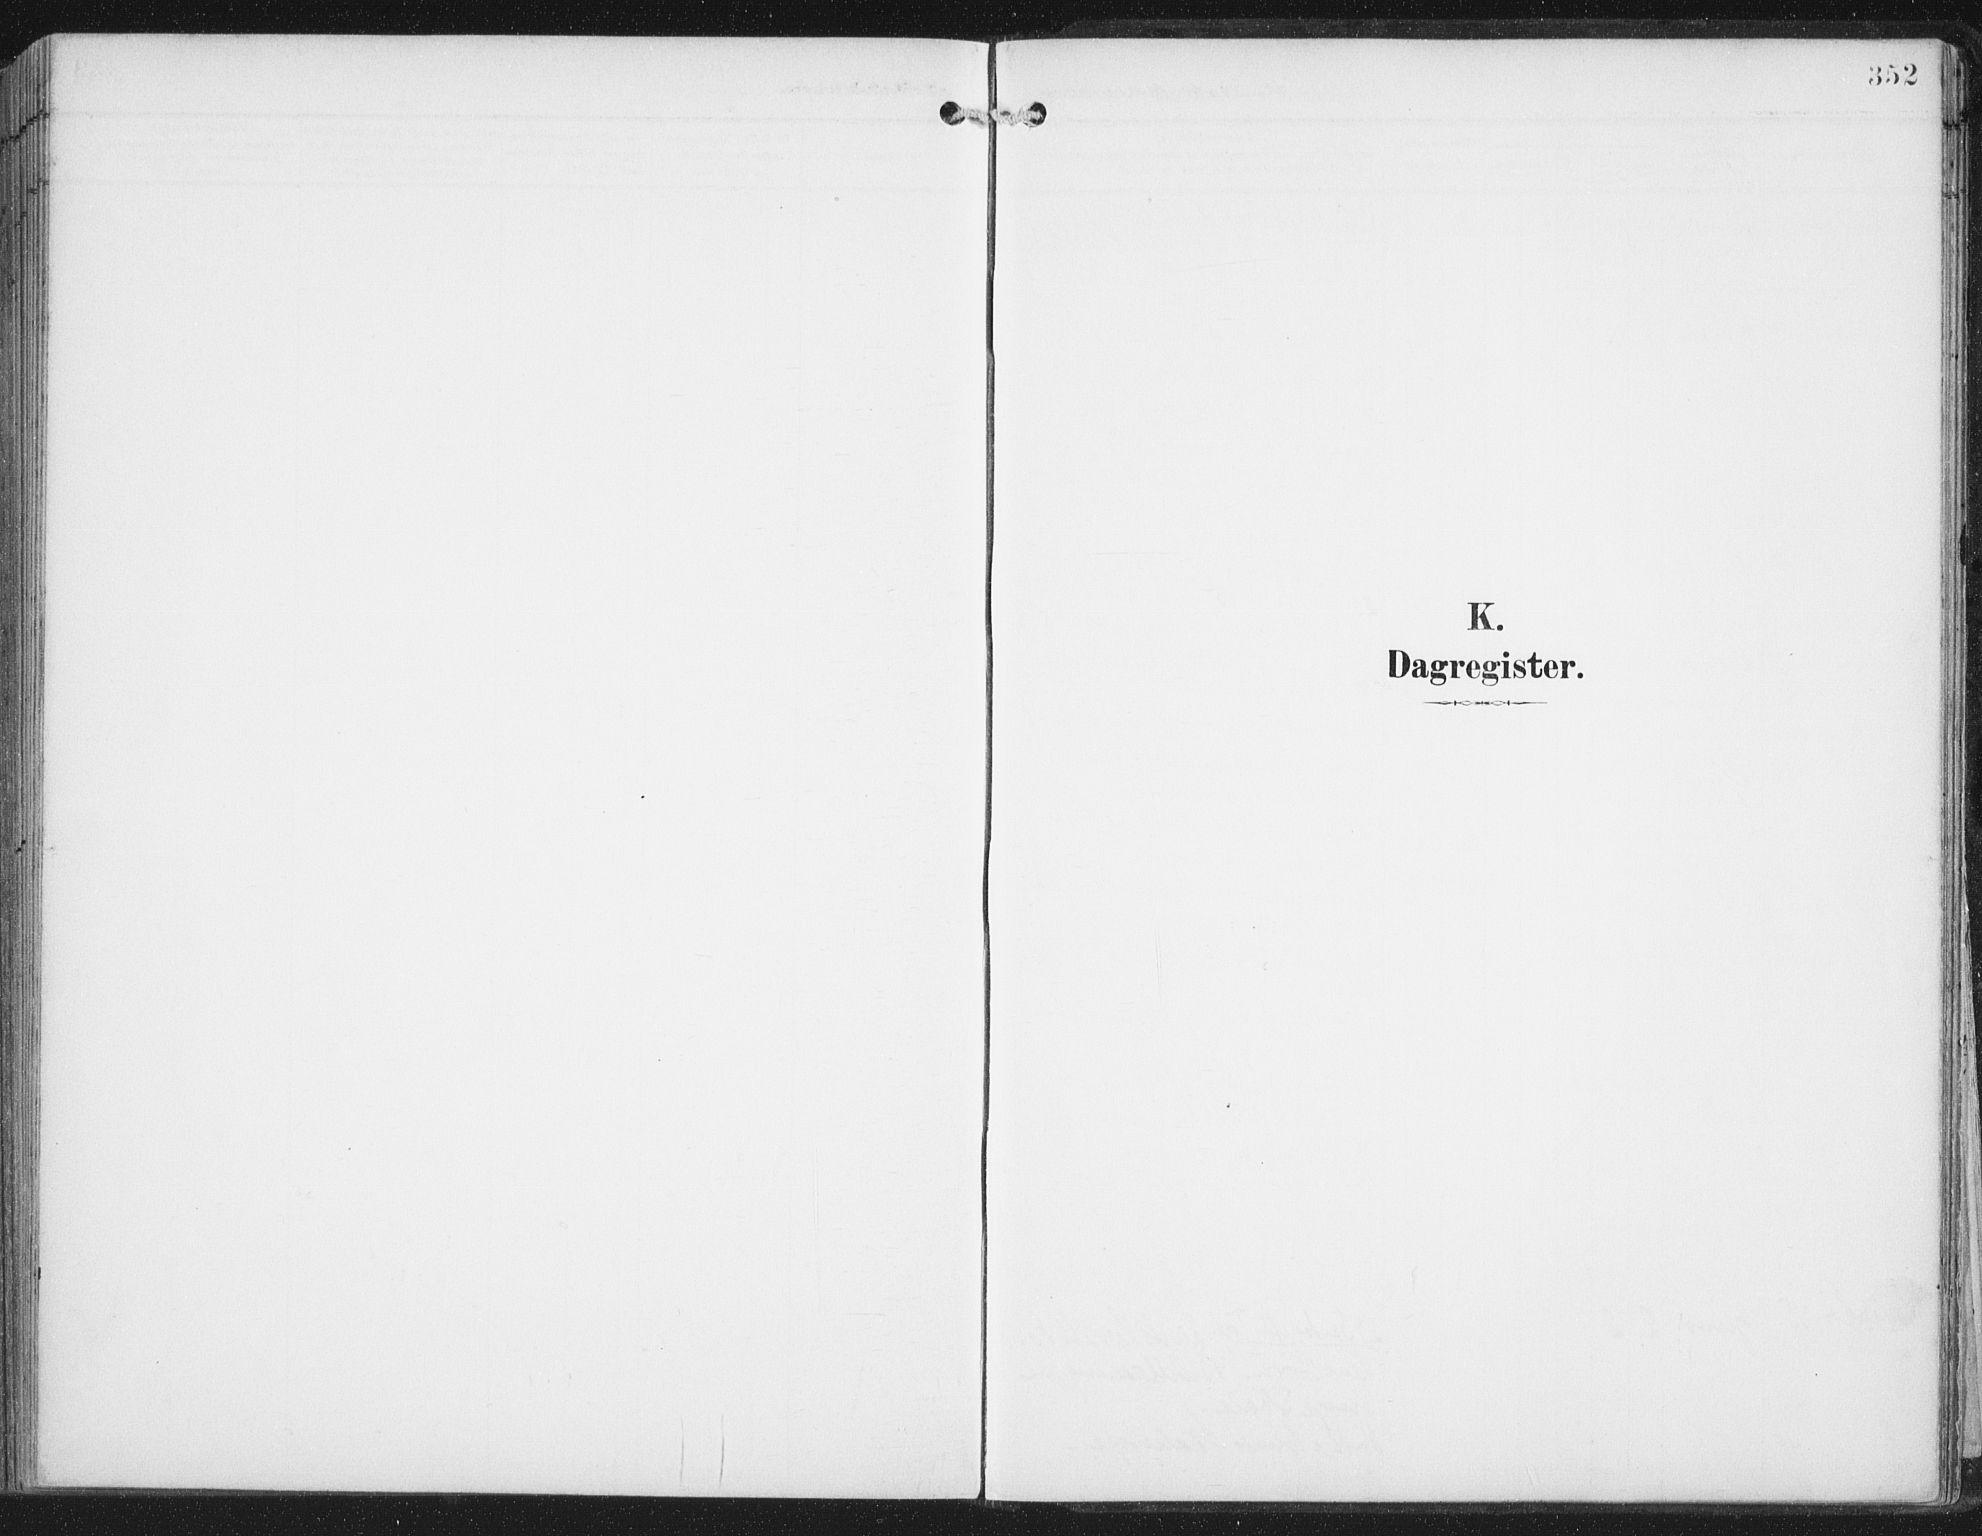 SAT, Ministerialprotokoller, klokkerbøker og fødselsregistre - Nordland, 876/L1098: Ministerialbok nr. 876A04, 1896-1915, s. 352